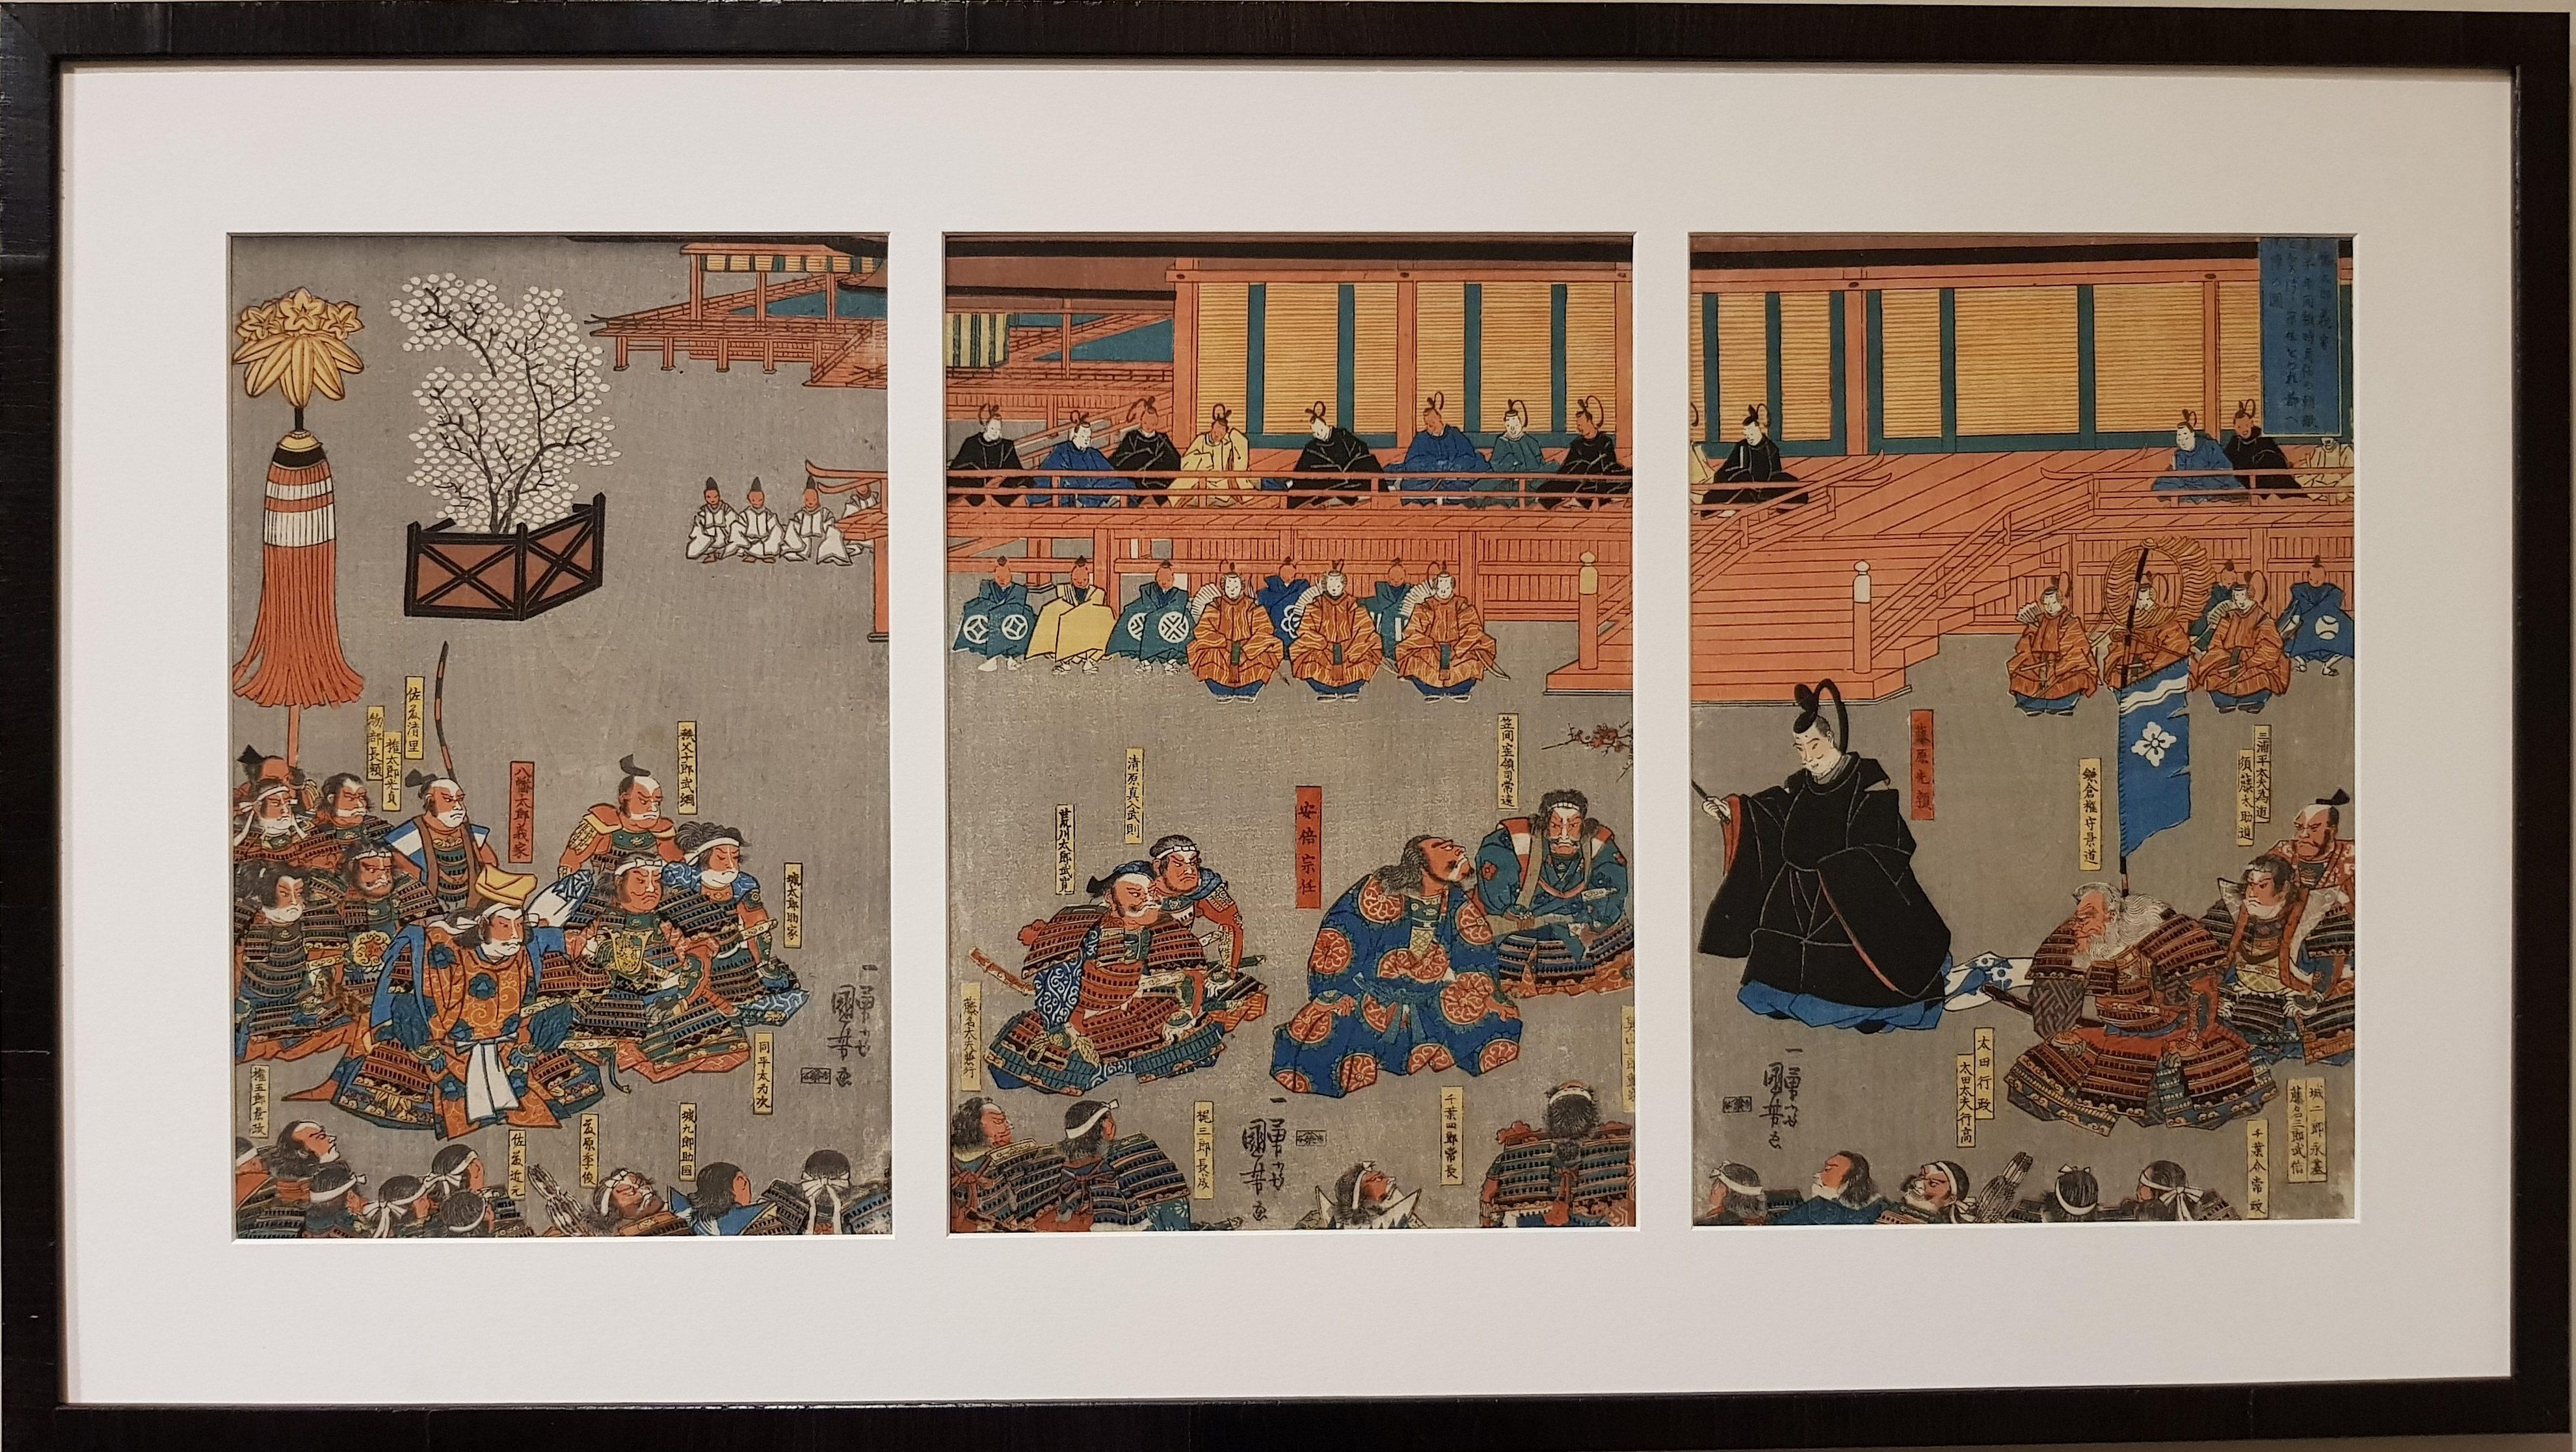 Japon - Estampe triptyque de Kuniyoshi Utagawa - Edo - VENDU Image